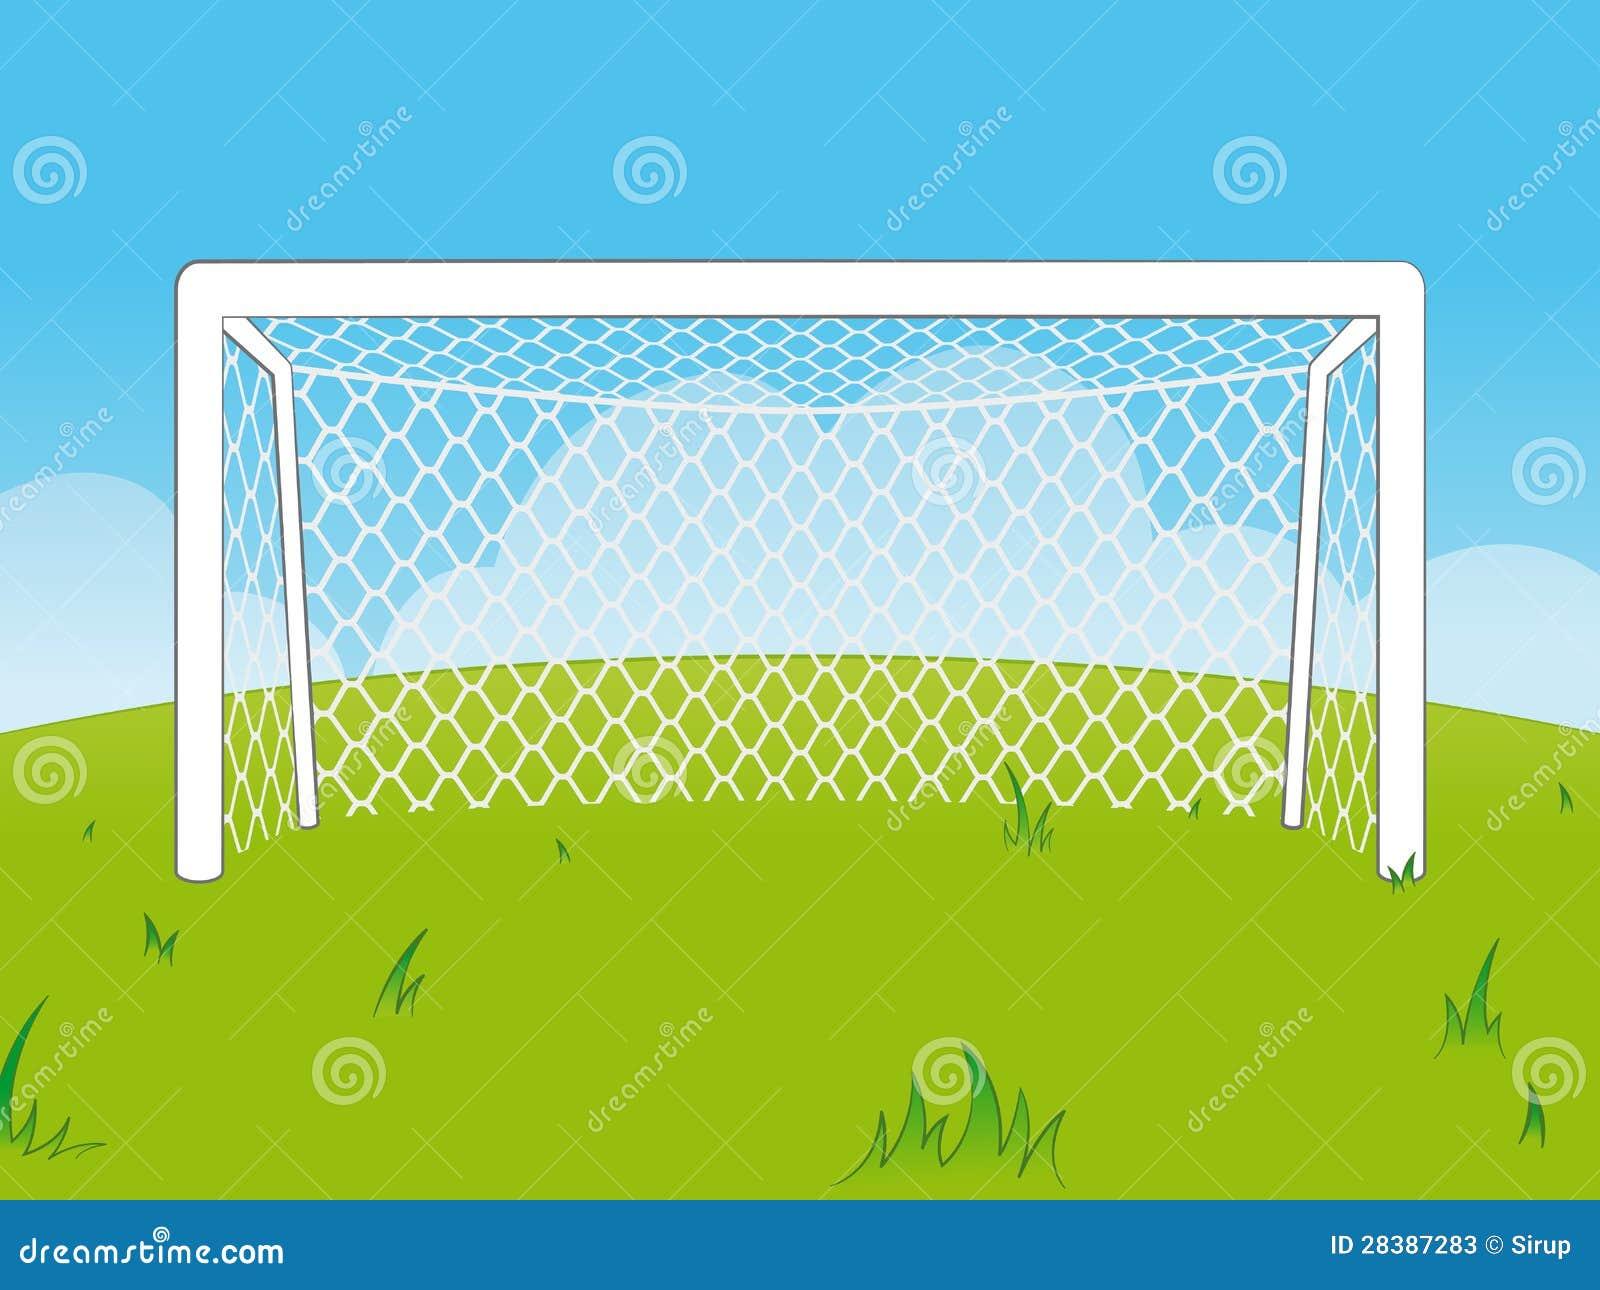 cartoon goalposts with a net stock photos image 28387283 field goal clip art free editable field hockey goal clipart